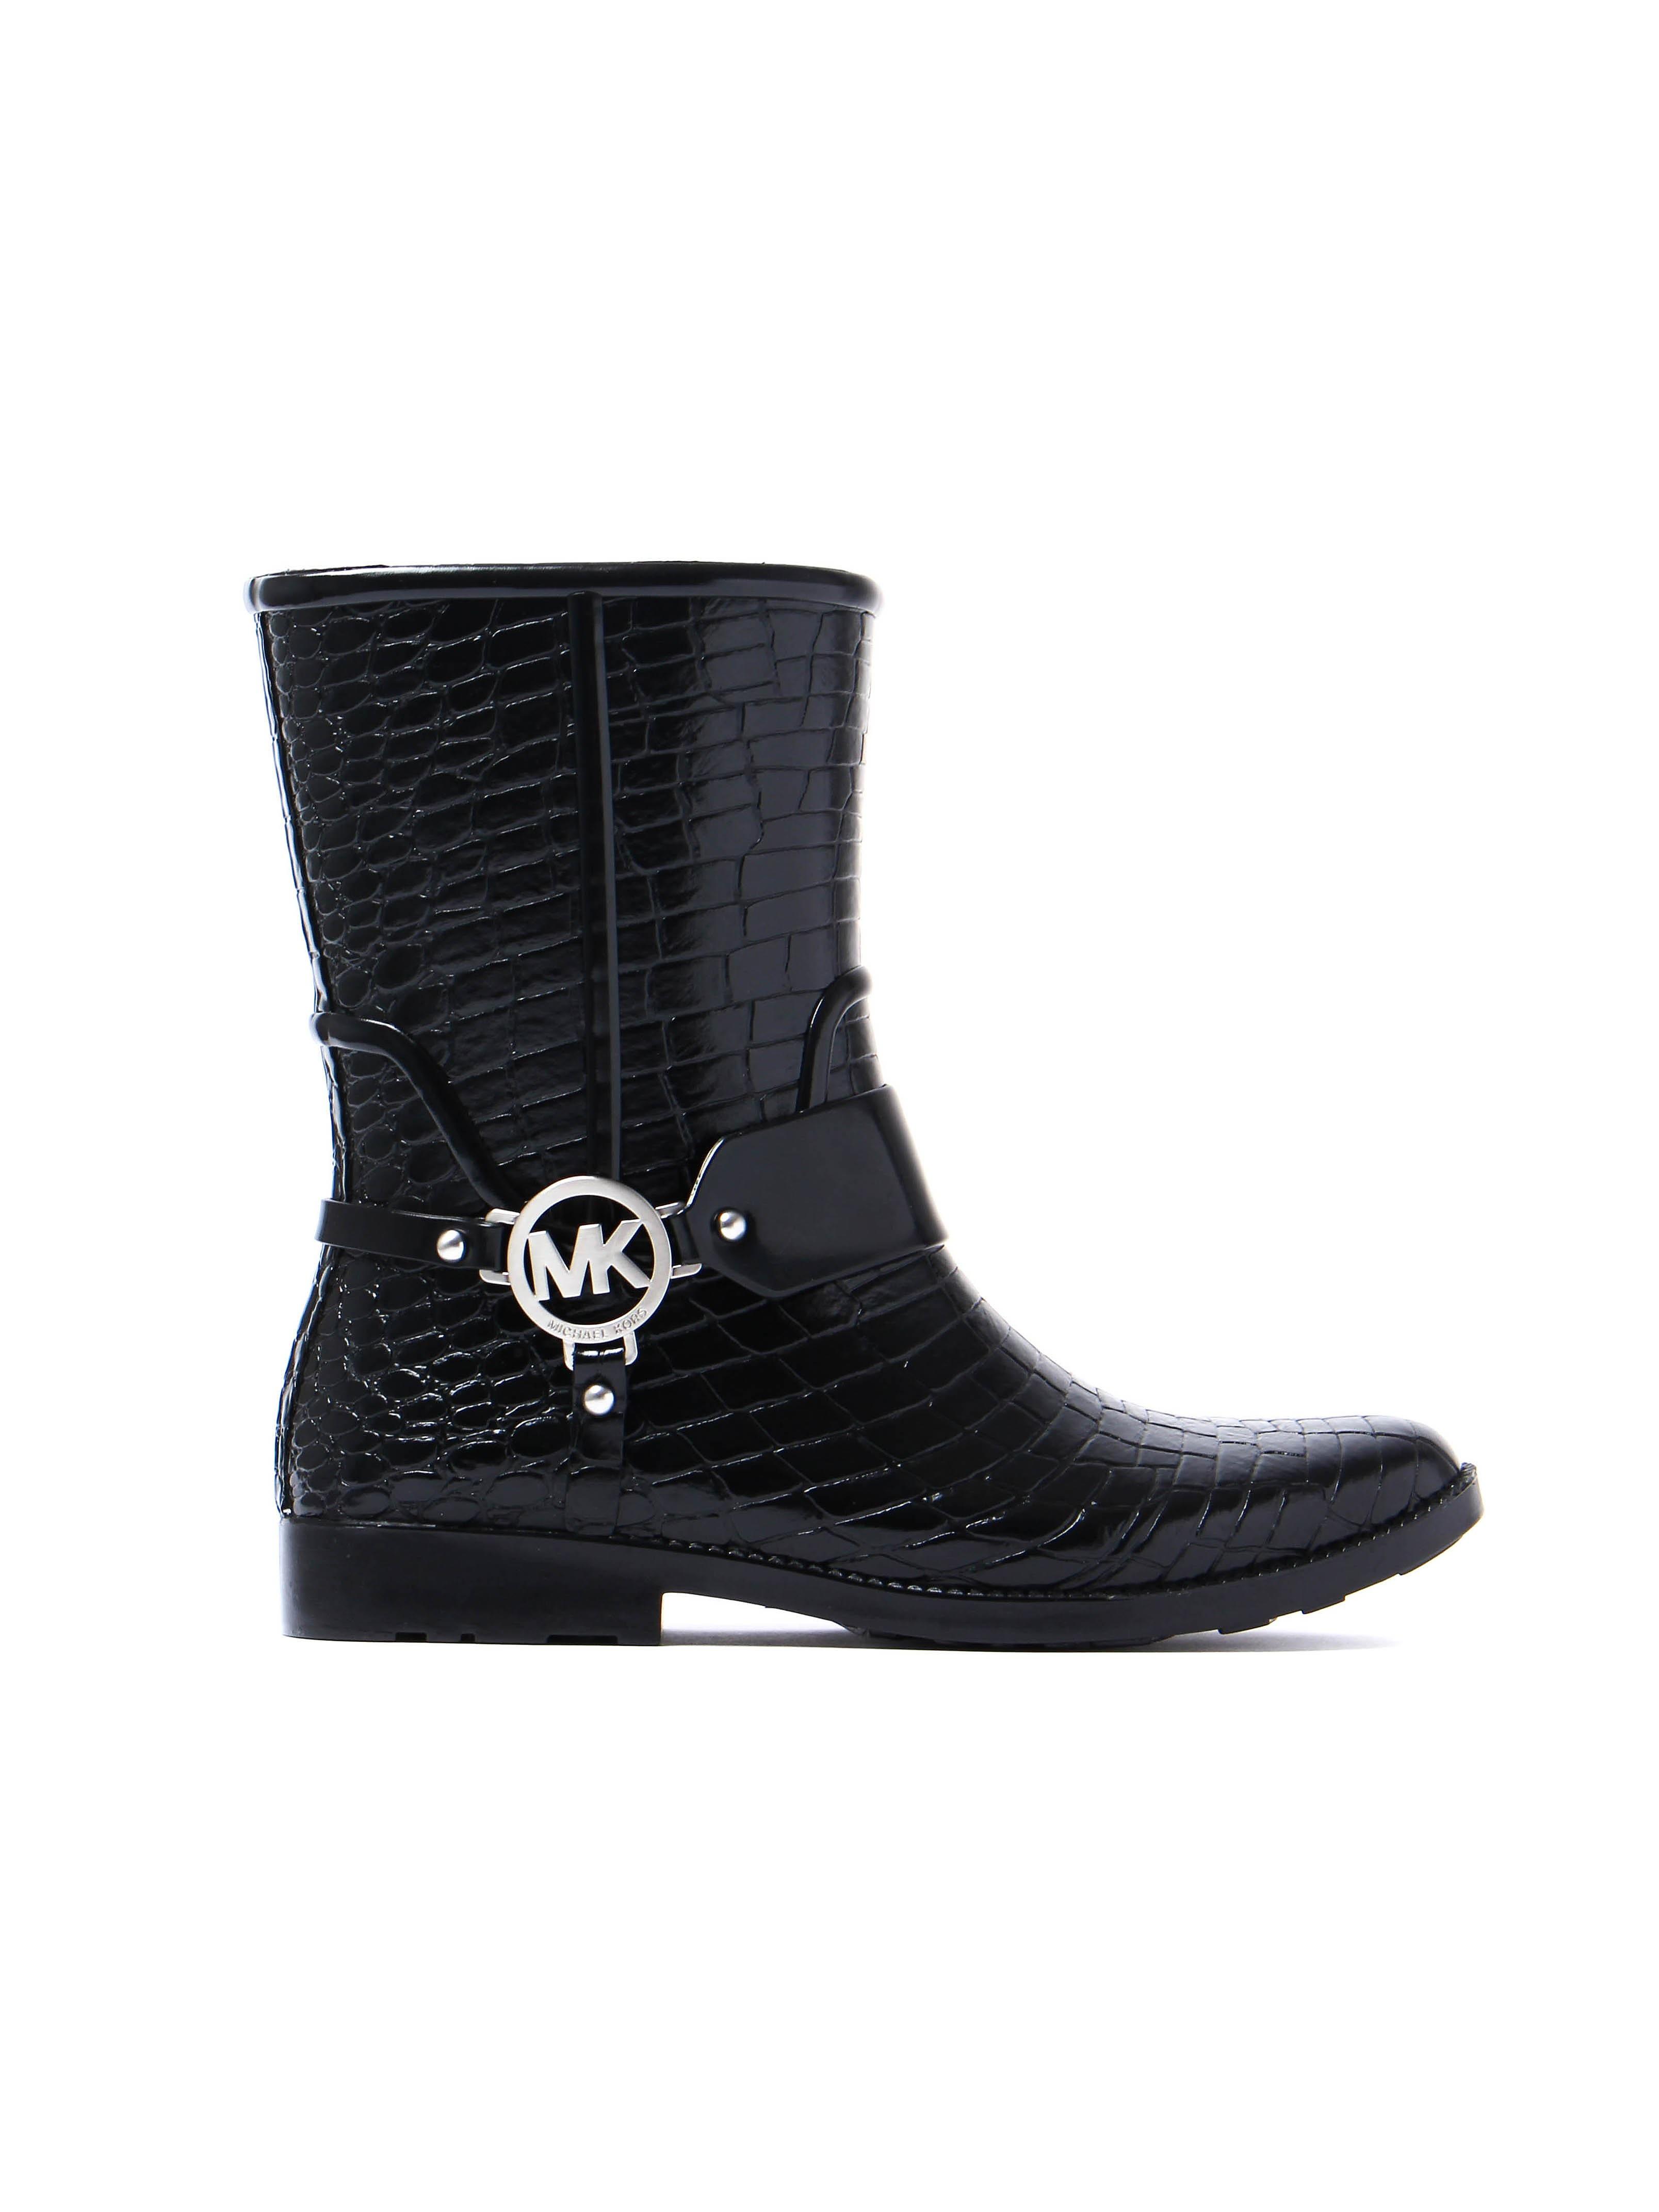 MICHAEL Michael Kors Women's Croco Rain Bootie - Black